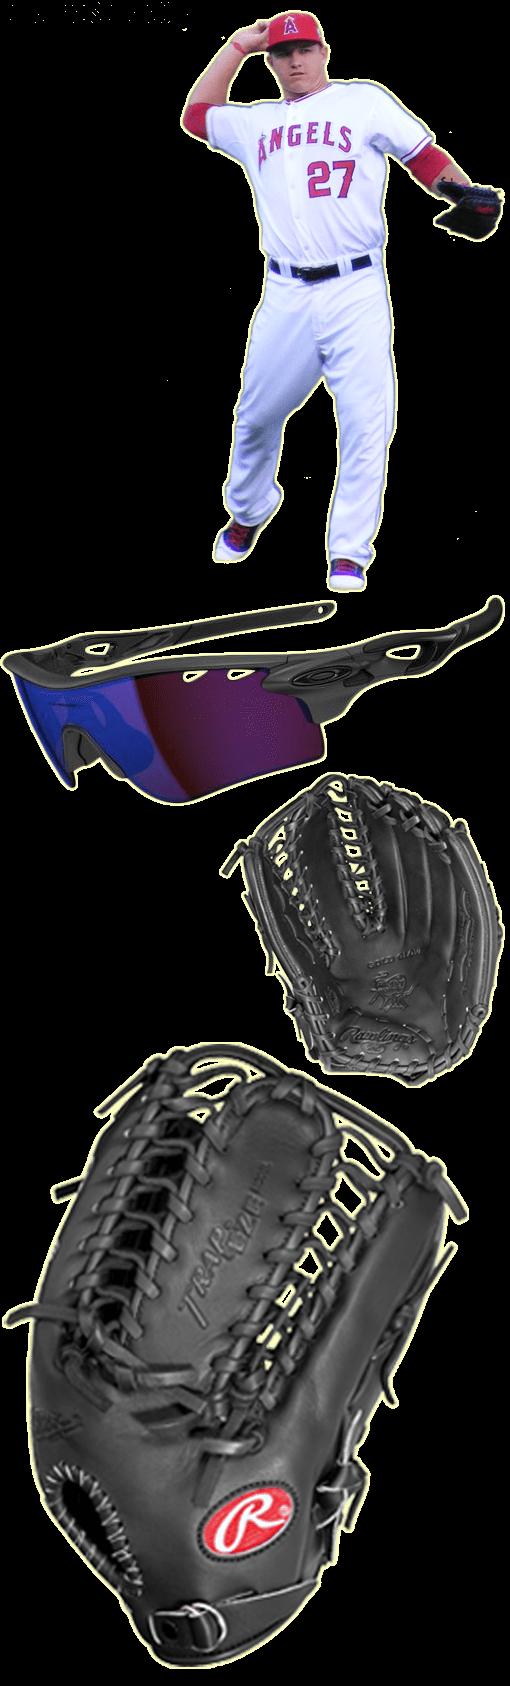 mike trout glove model, mike trout sunglasses, rawlings protb24, oakley radarlock path